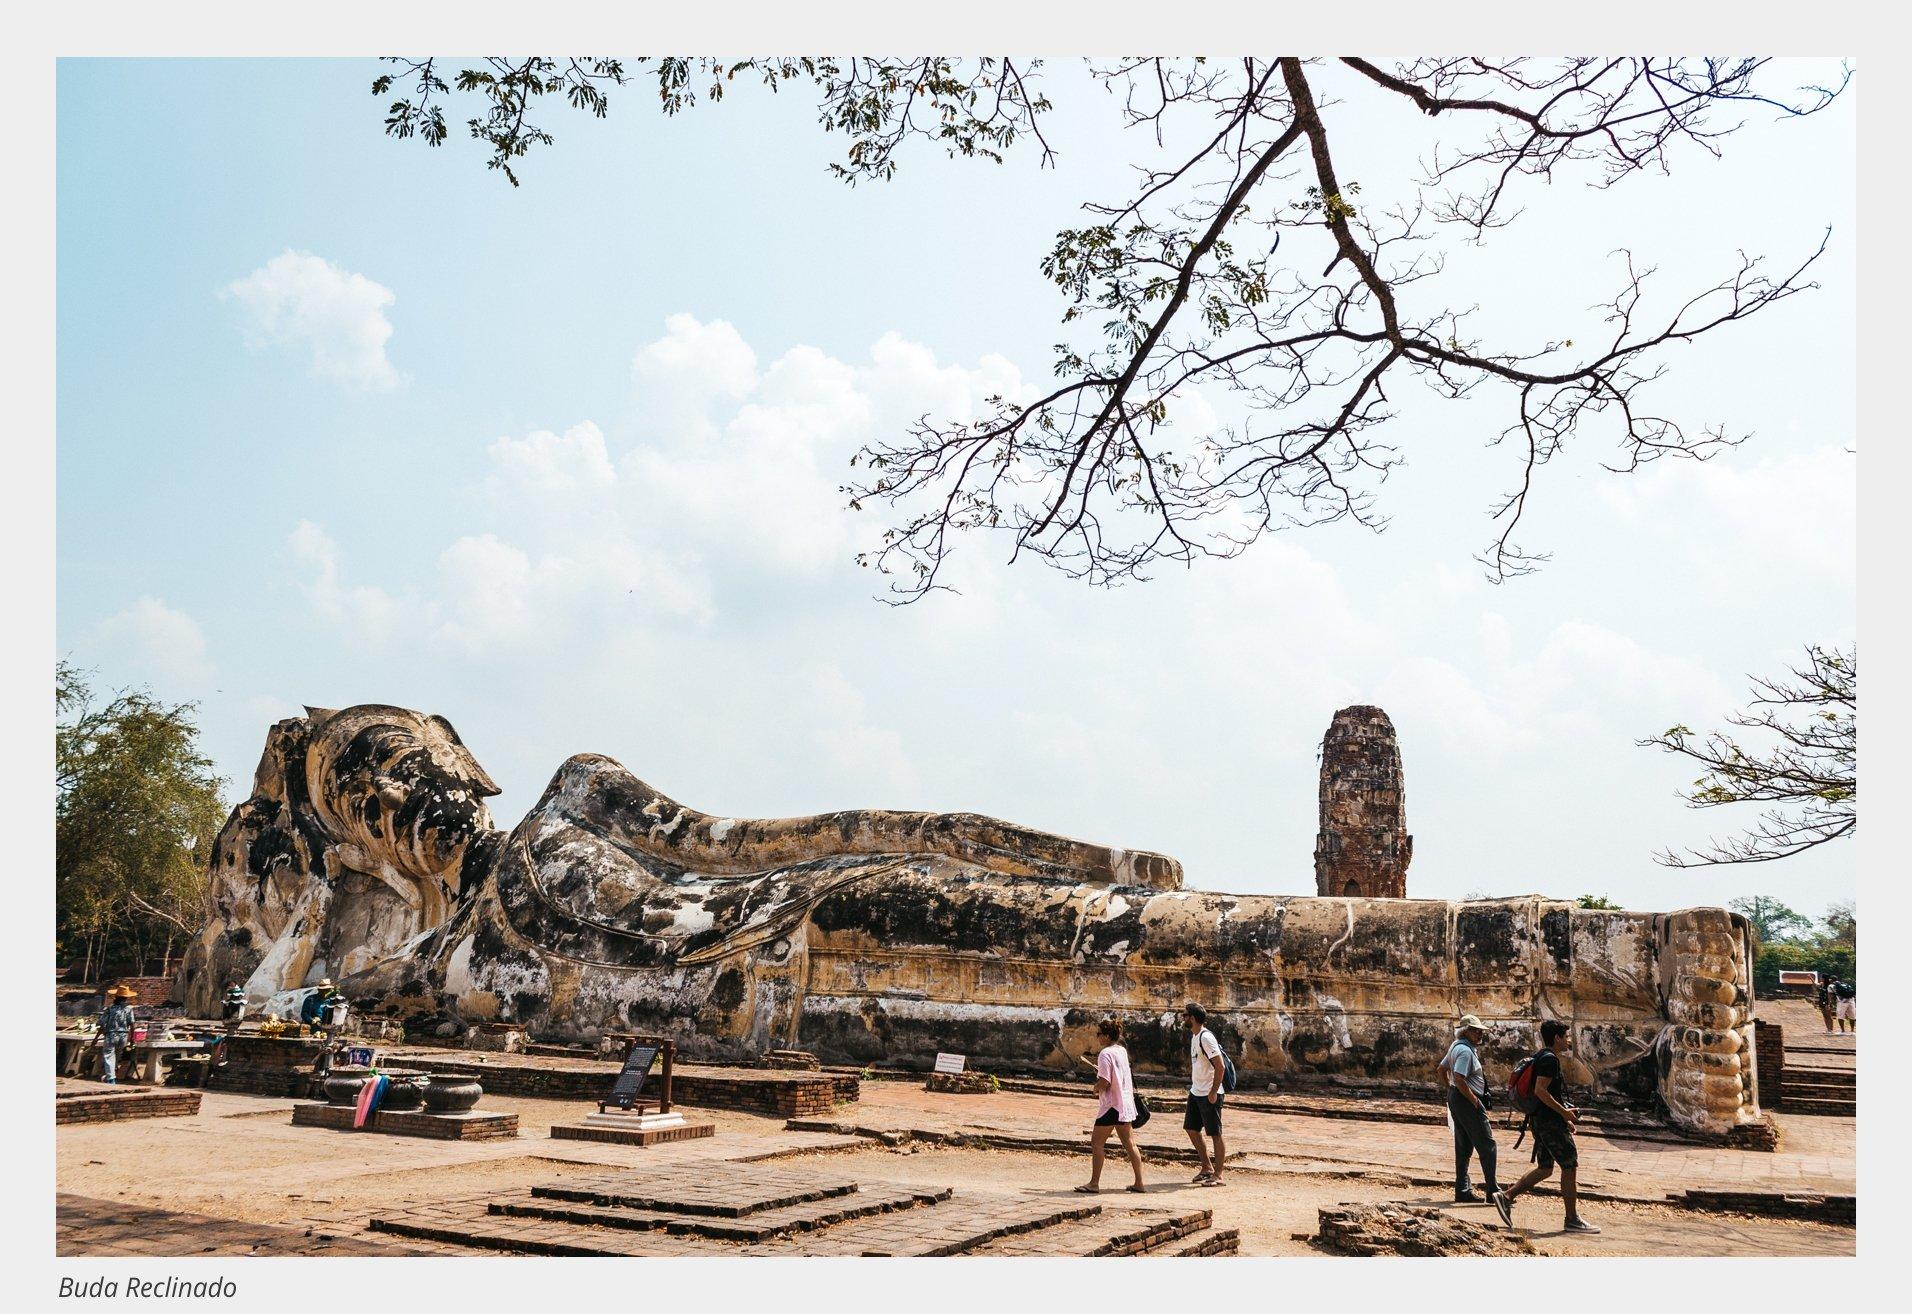 Ayutthaya: Buda Reclinado